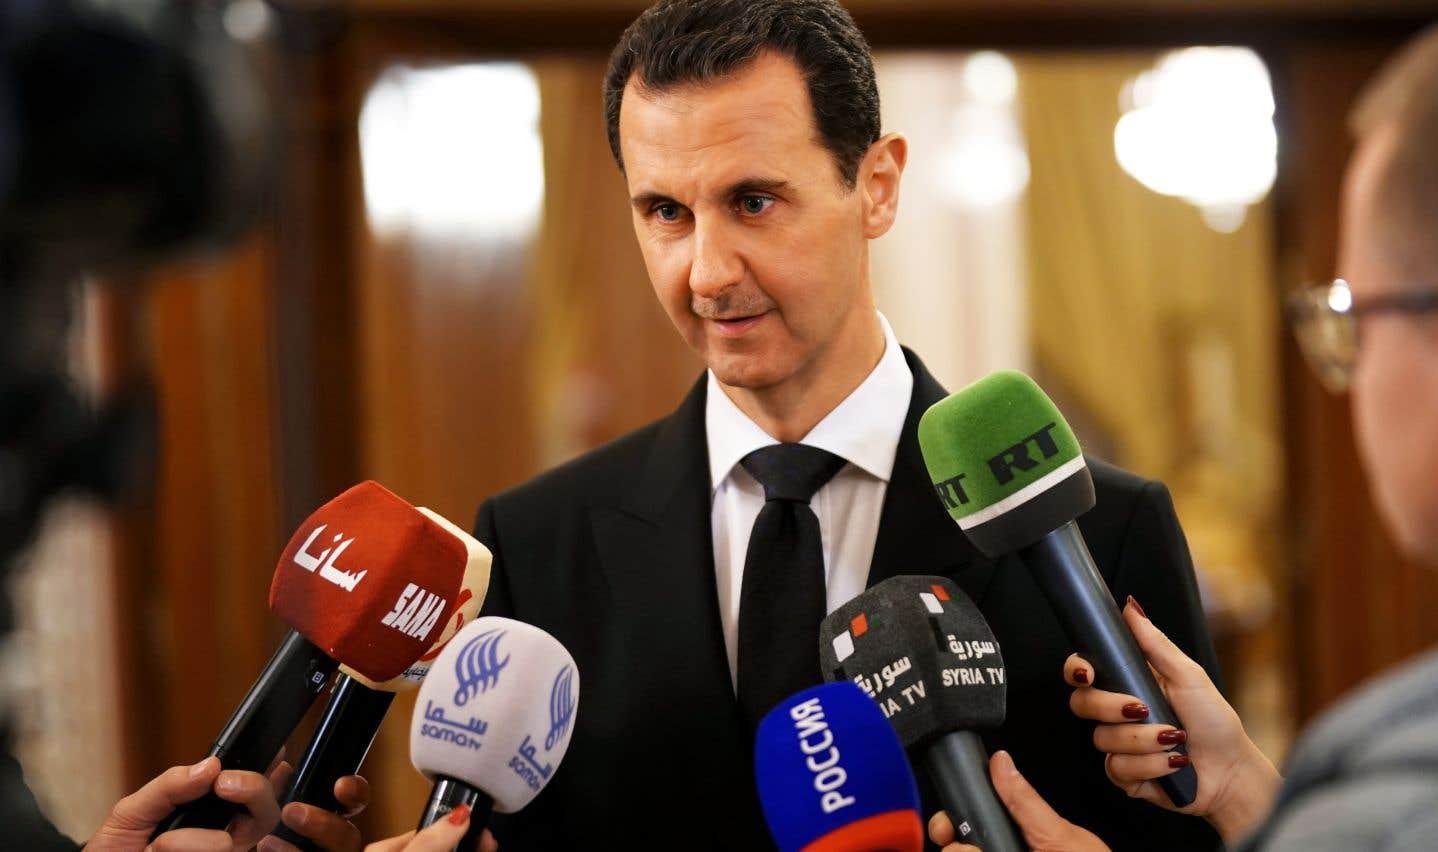 Le président syrien, Bachar al-Assad